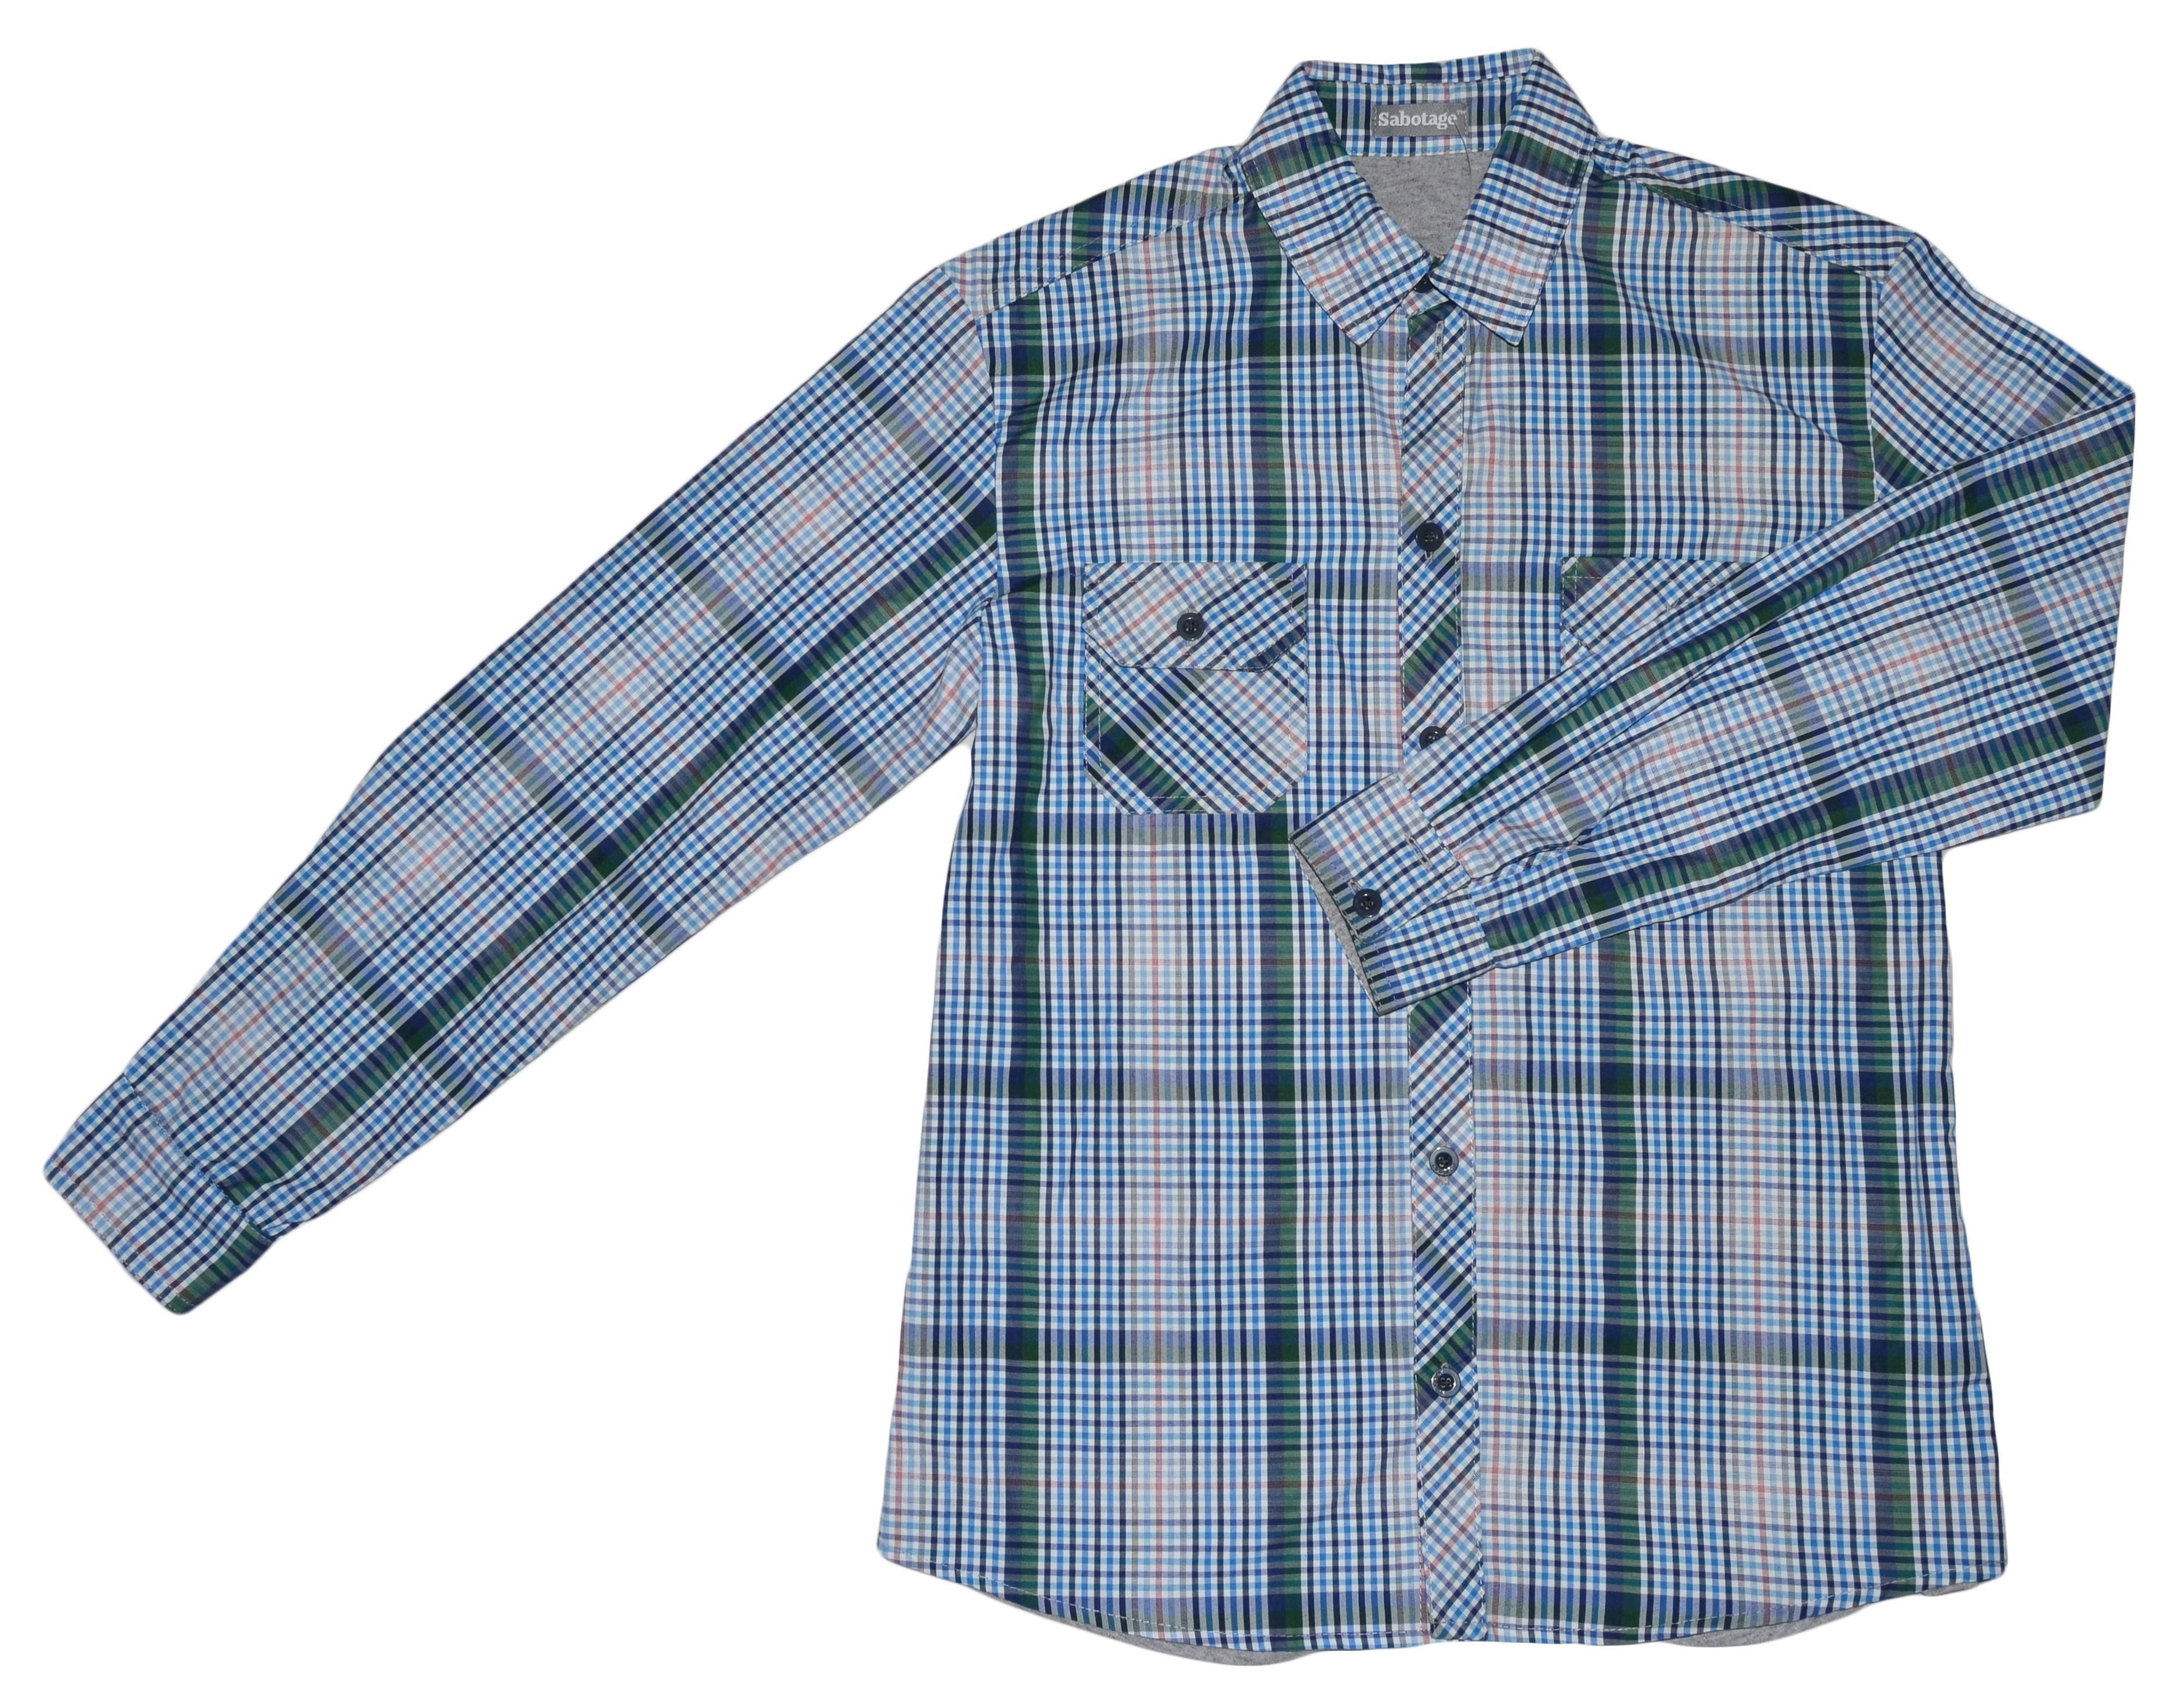 Рубашка для мальчика YS-B4770бир